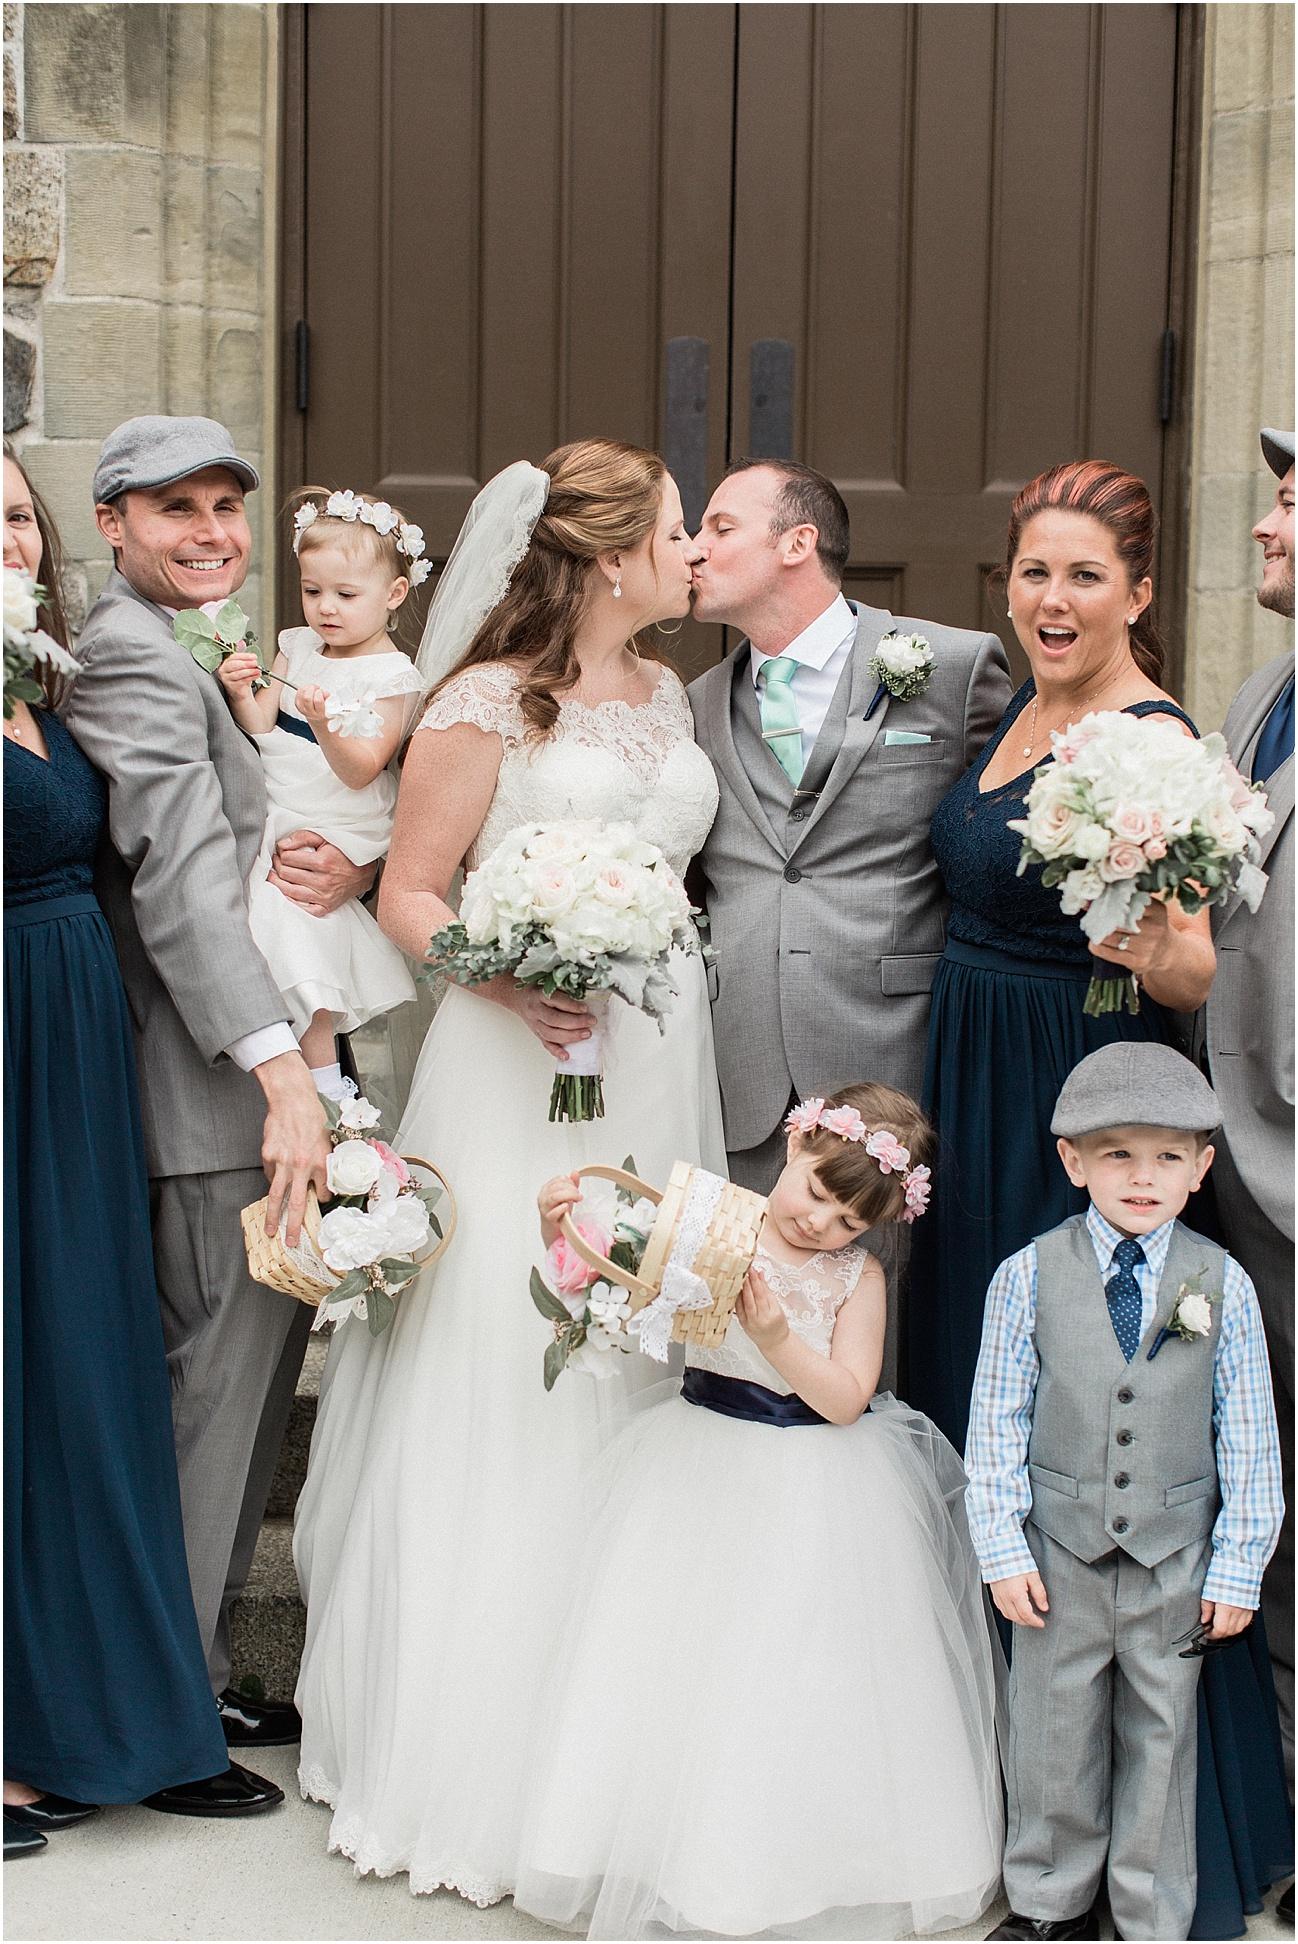 jaclyn_adam_st_ann_brendans_dorchester_southie_castle_bride_groom_venezia_waterfront__cape_cod_boston_wedding_photographer_meredith_jane_photography_photo_0906.jpg